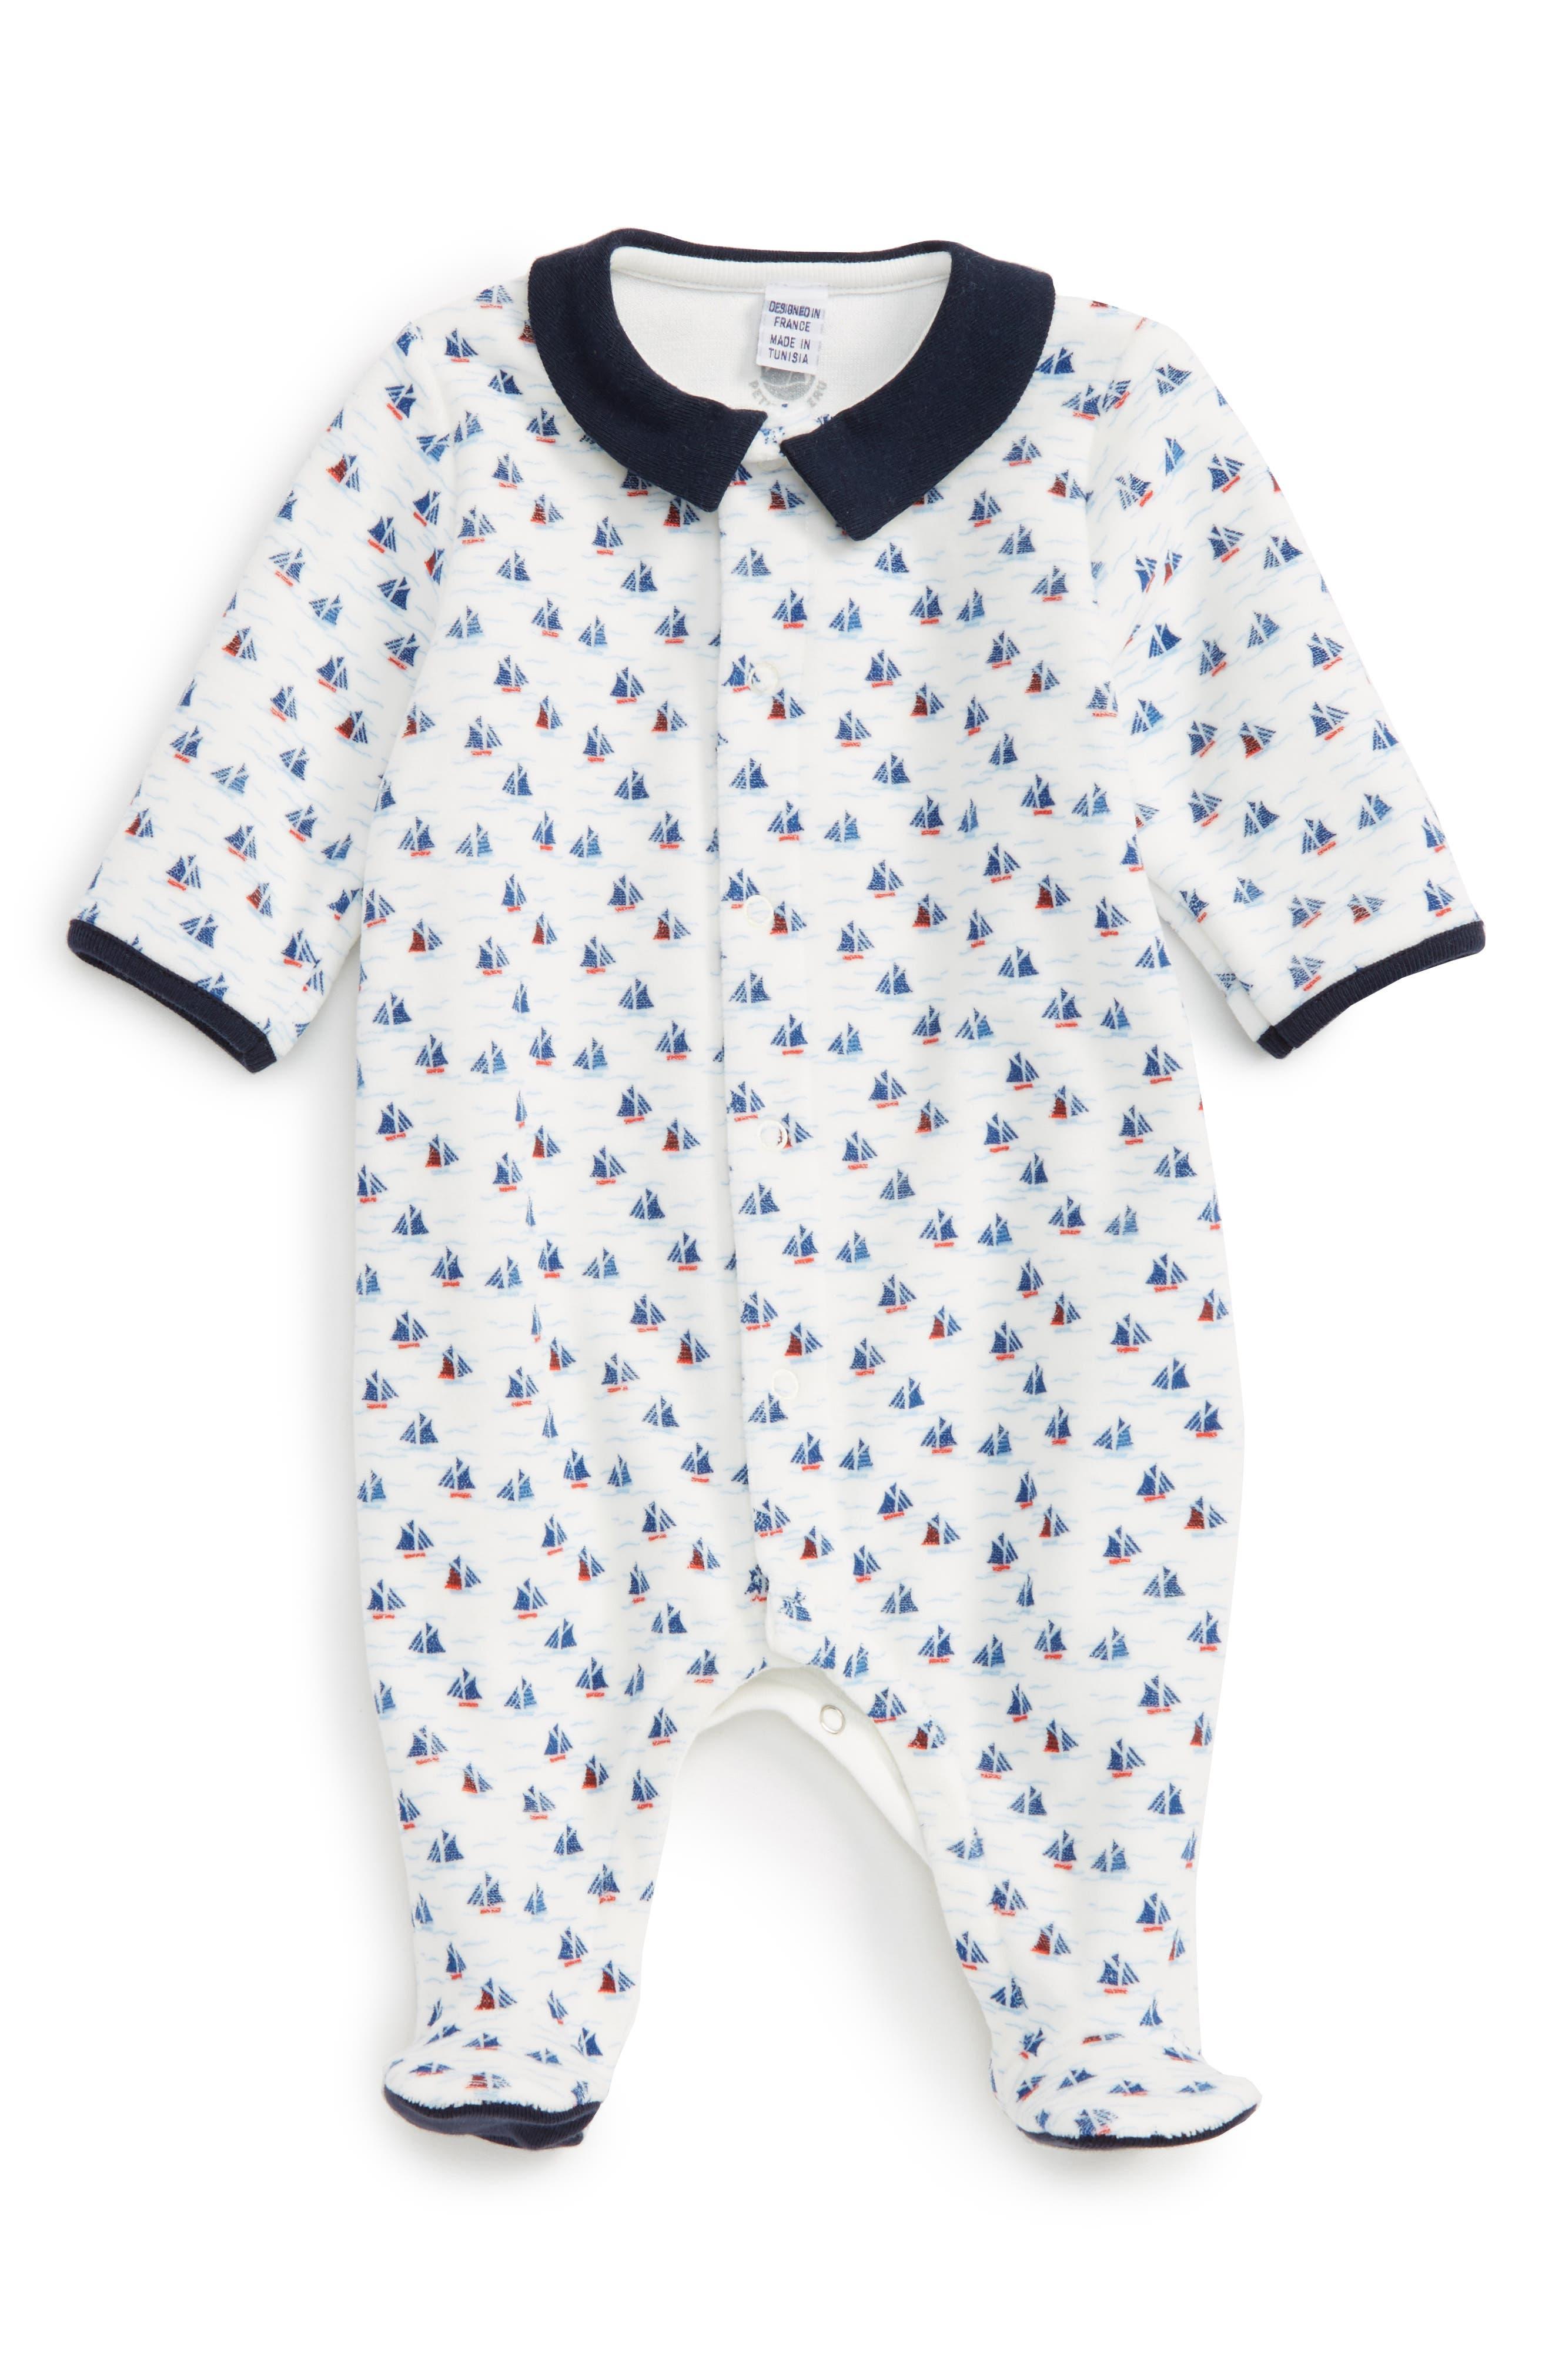 Velour Footie,                         Main,                         color, White/ Navy/ Multi